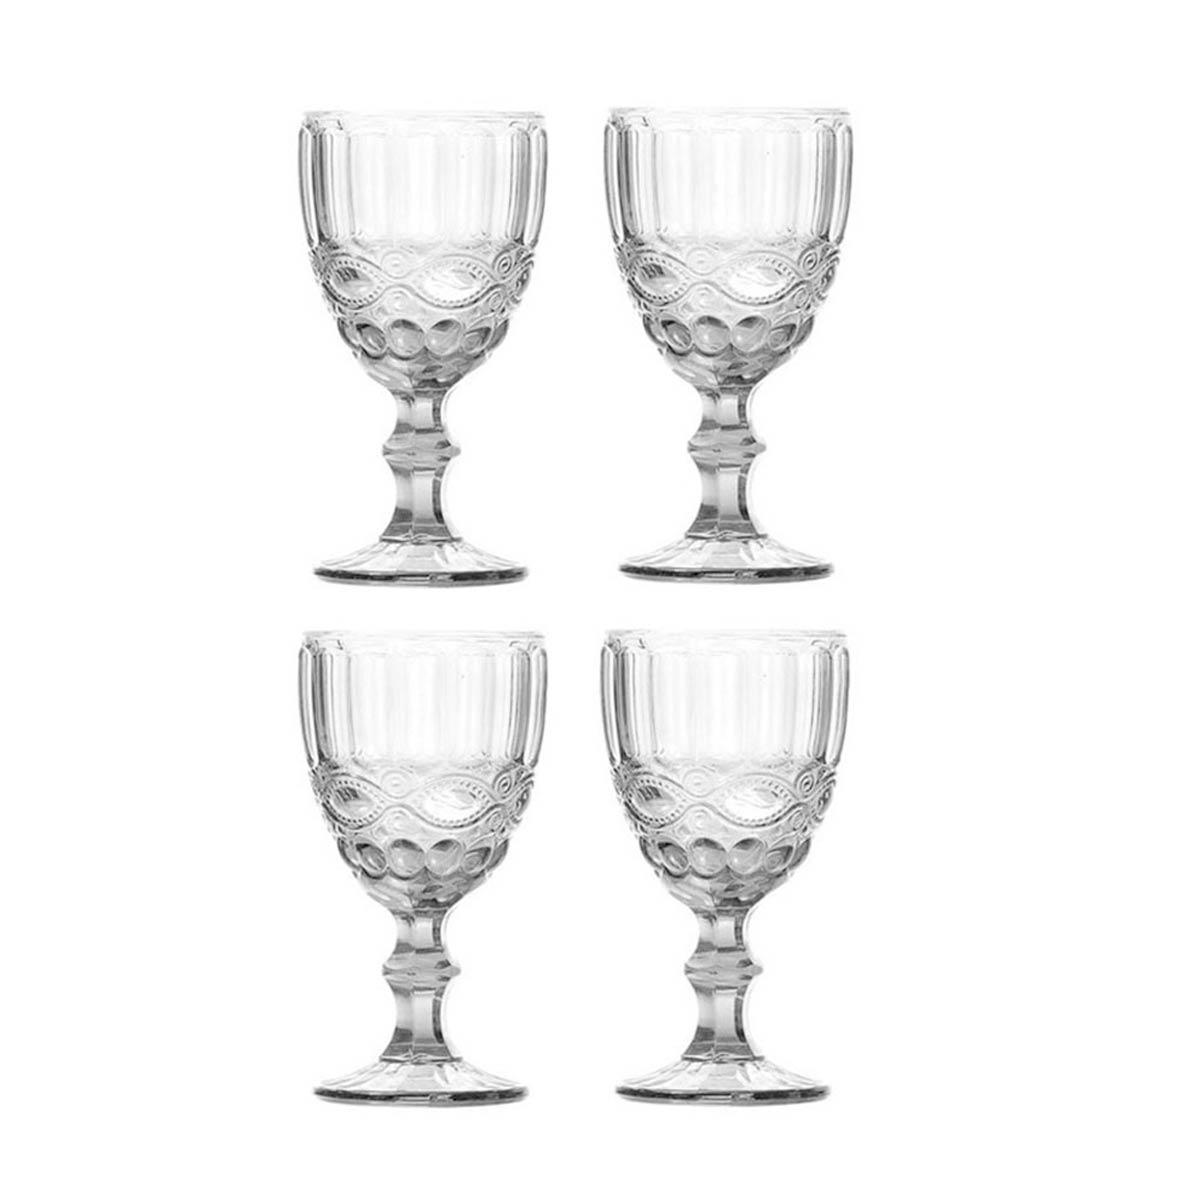 Kit 4 Taças de Água de Vidro Libélula Transparente 310 ml  - Lemis